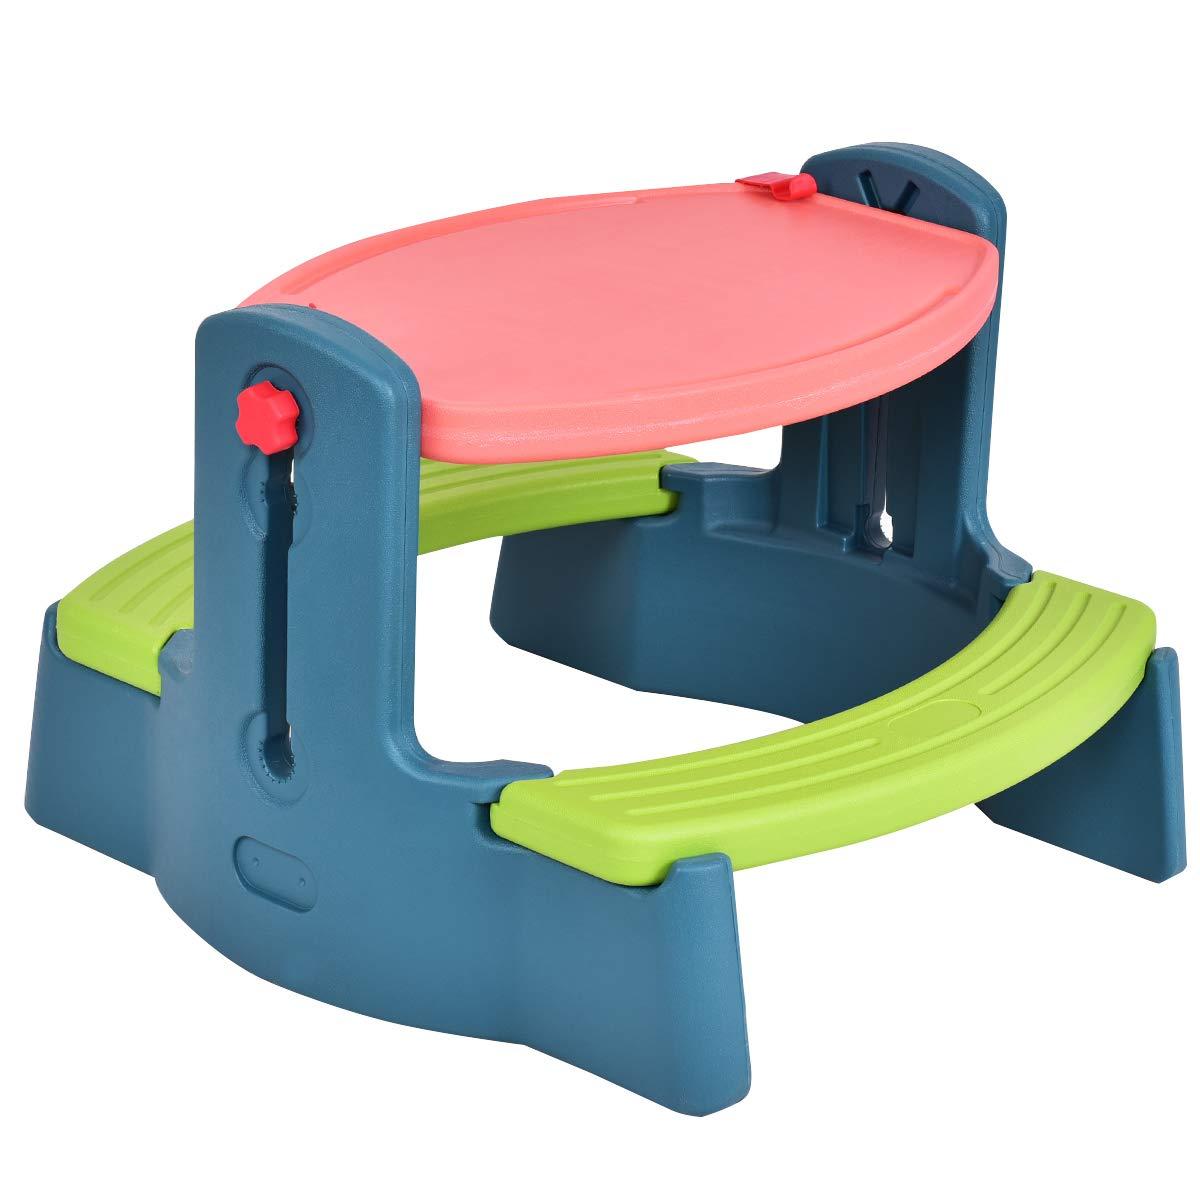 Honey Joy キッズ アートテーブルチェアセット 2イン1 高さ調節可能 クリエイティブデスクイーゼル   B07KF5H3Q8